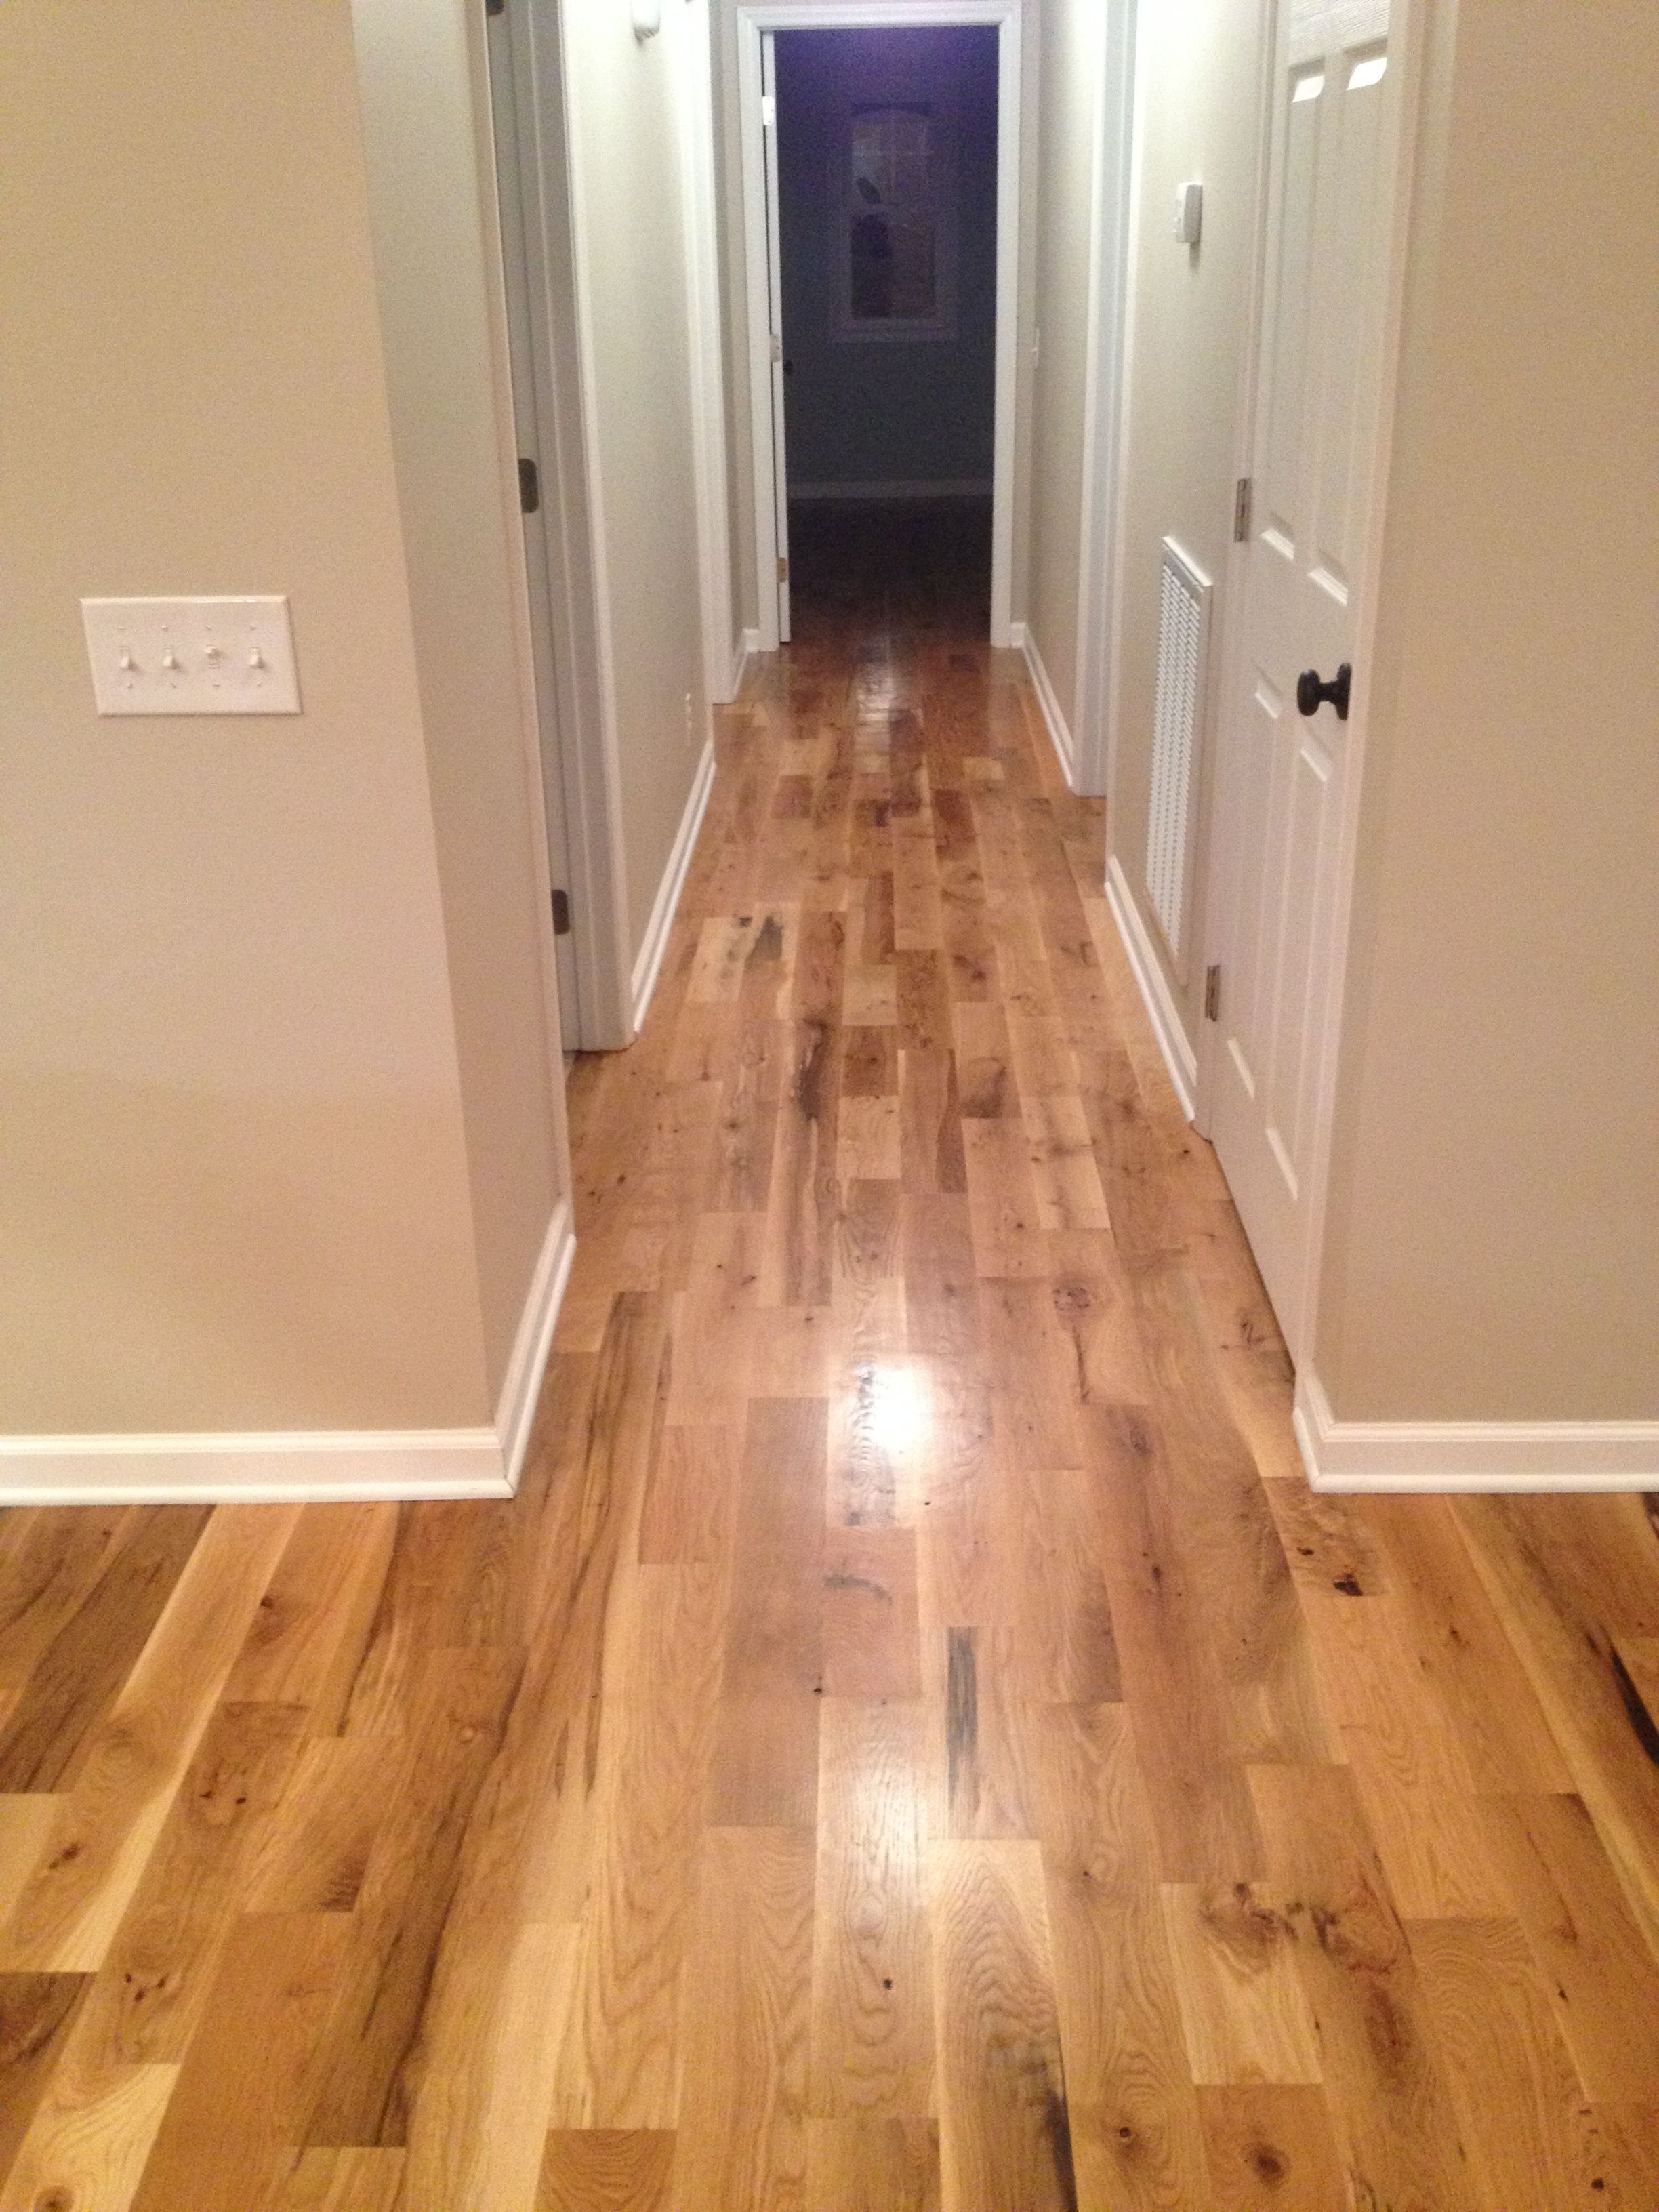 "4 1/4"" 2 Common White Oak Hardwood Floors from Munday"